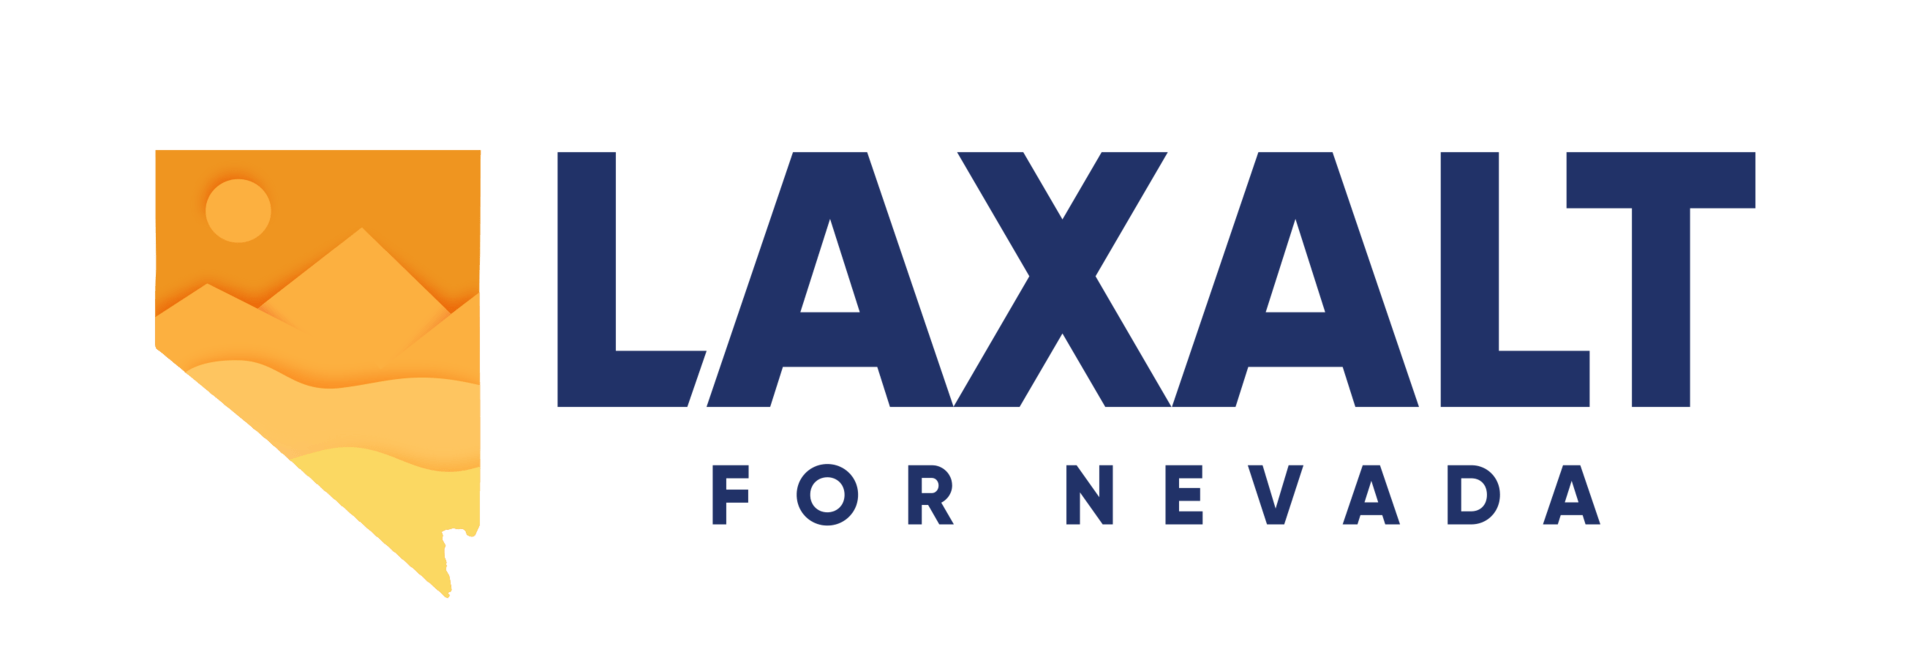 Laxalt logo2 main